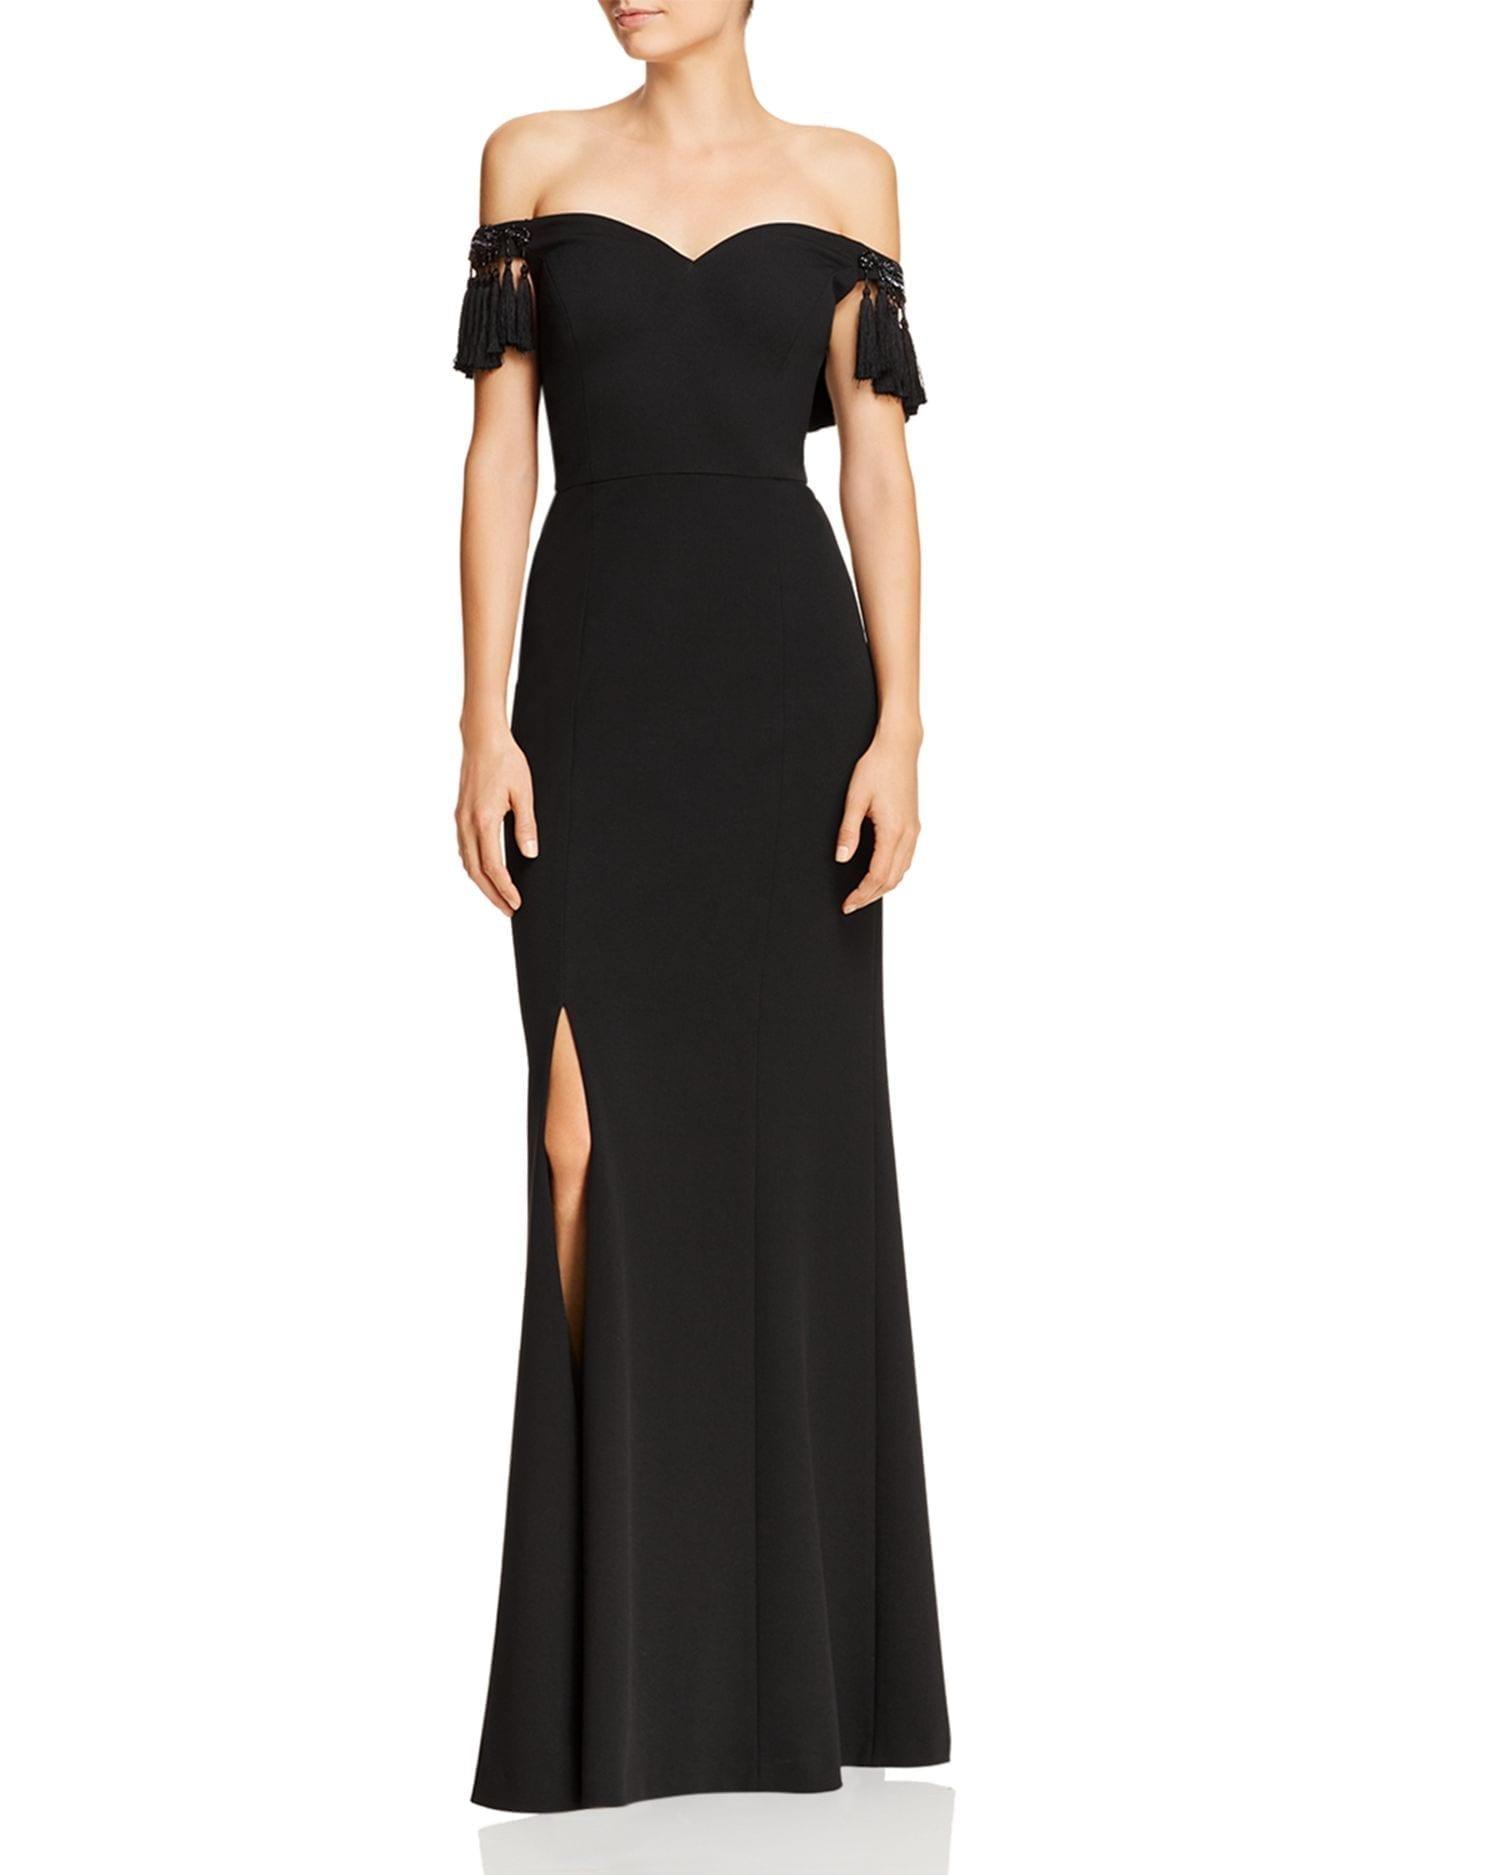 Aidan Mattox Off The Shoulder Tasseled Black Gown We Select Dresses